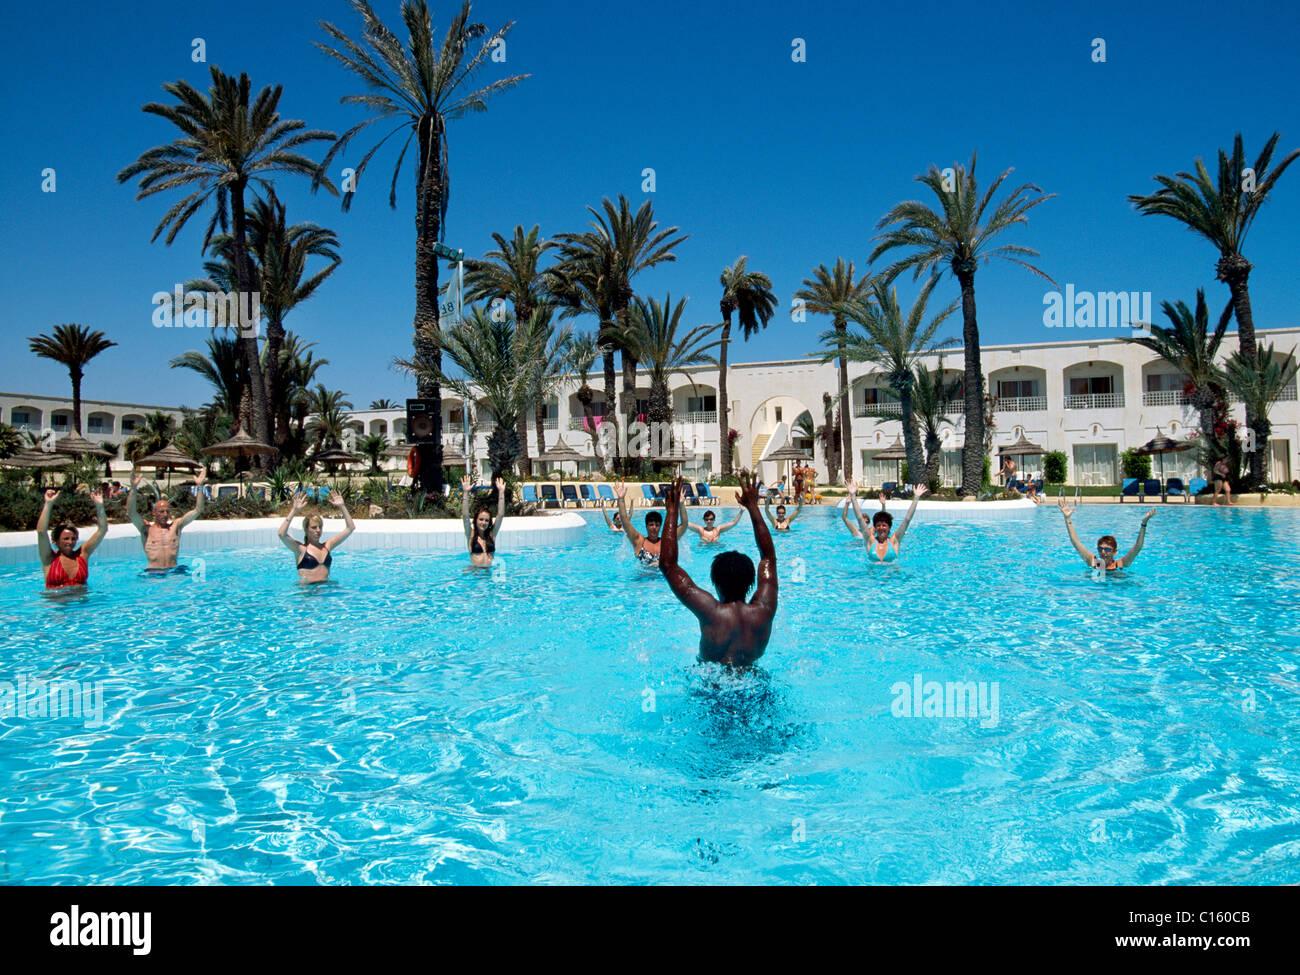 Organized entertainment, swimming pool, Iberostar Hotel, Zarzis, Djerba, Tunisia, Africa - Stock Image